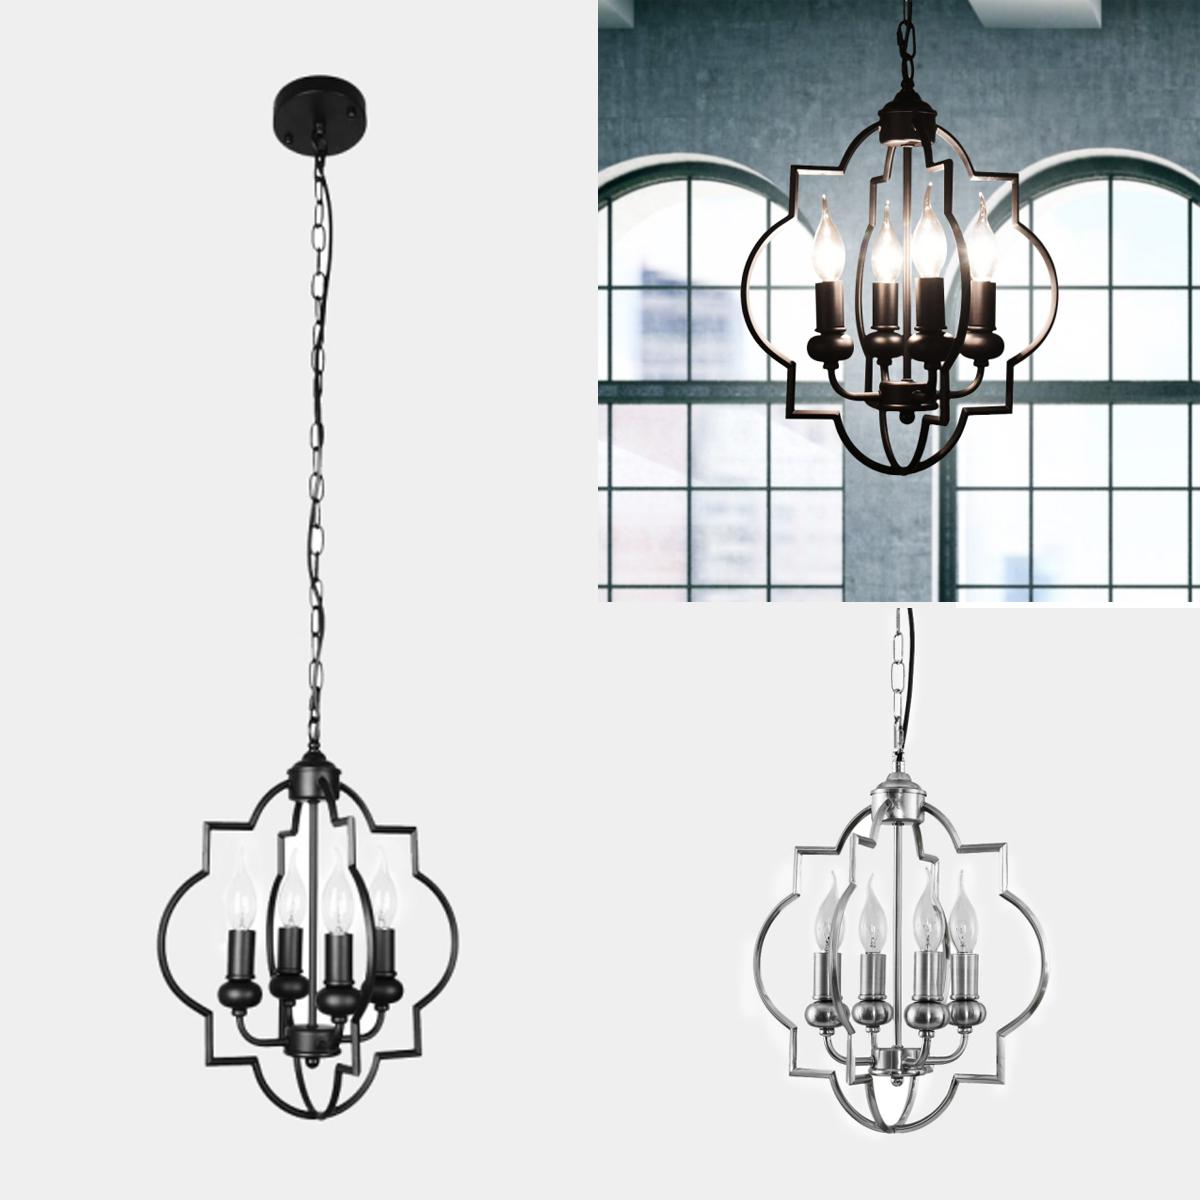 4 Lights Industrial Chandelier Modern Farmhouse Pendant Light Ceiling Fixture Us Ebay